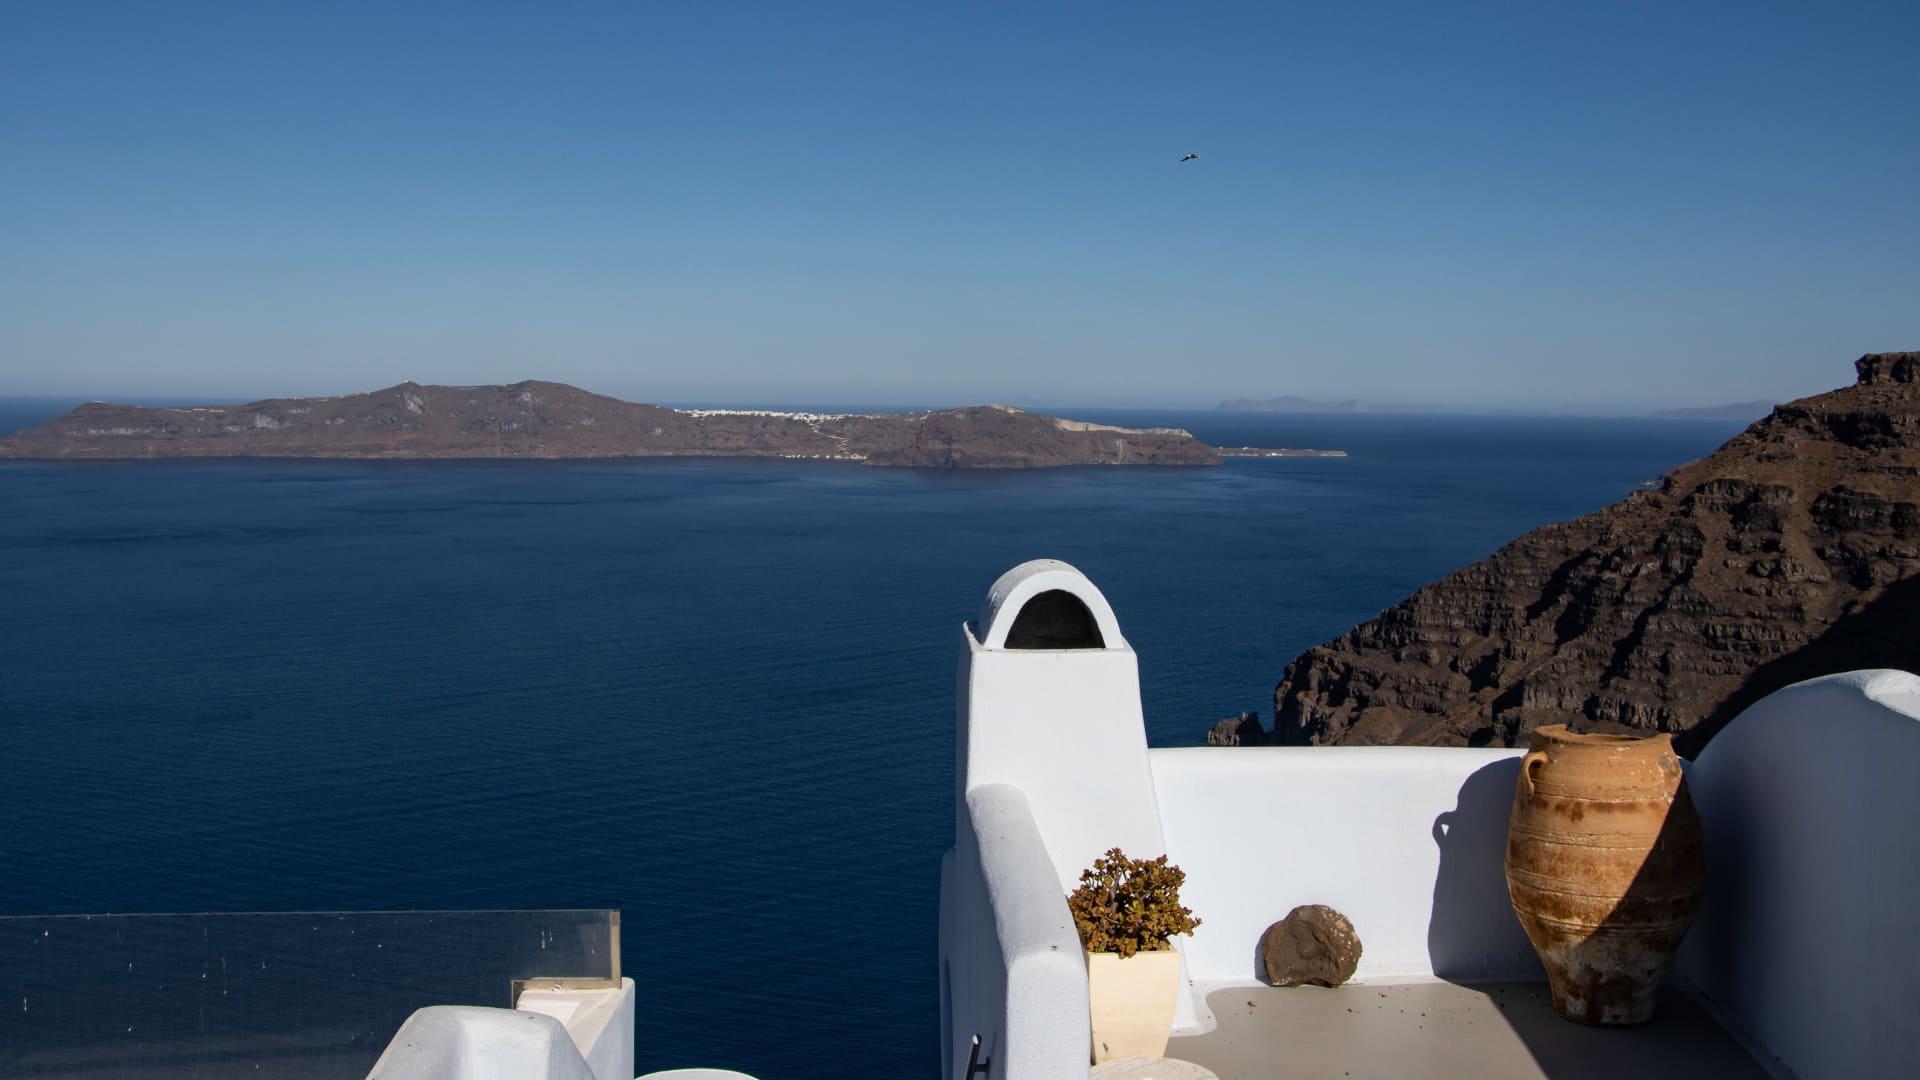 Panoramic view of Thera and Imerovigli of Santorini Volcanic Island in Cyclades - Aegean sea.